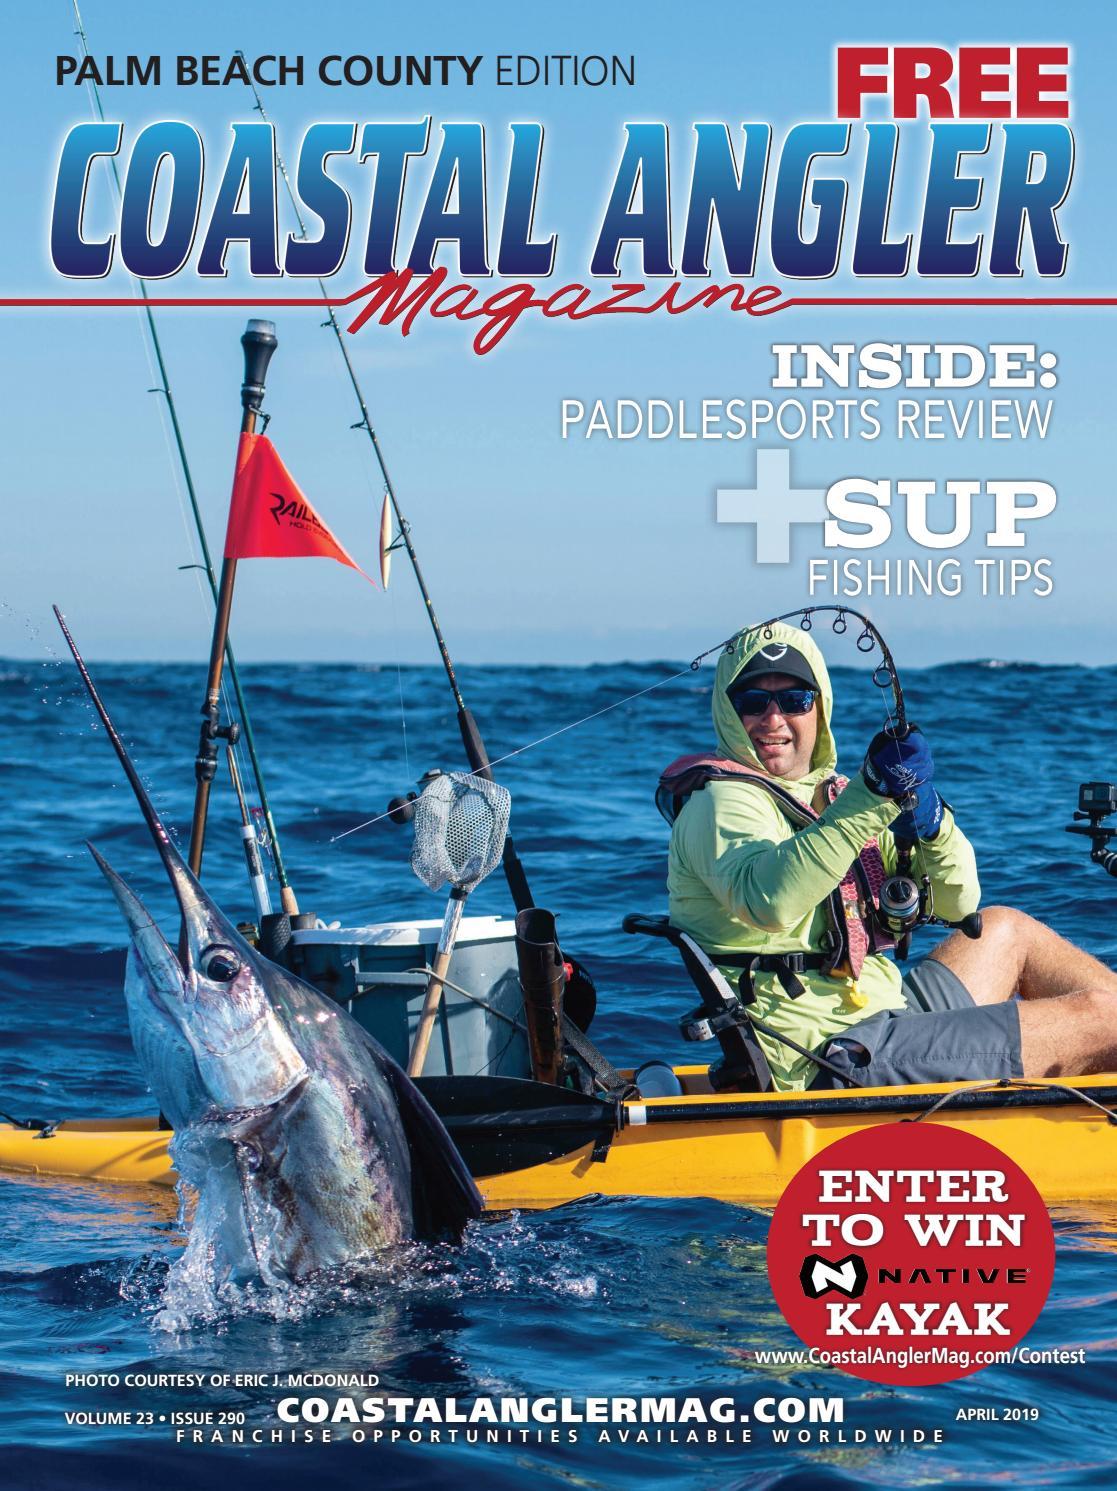 NEW Fishing Kite 5-25 Mph Range Boston Big Game Fishing Club Kite Black